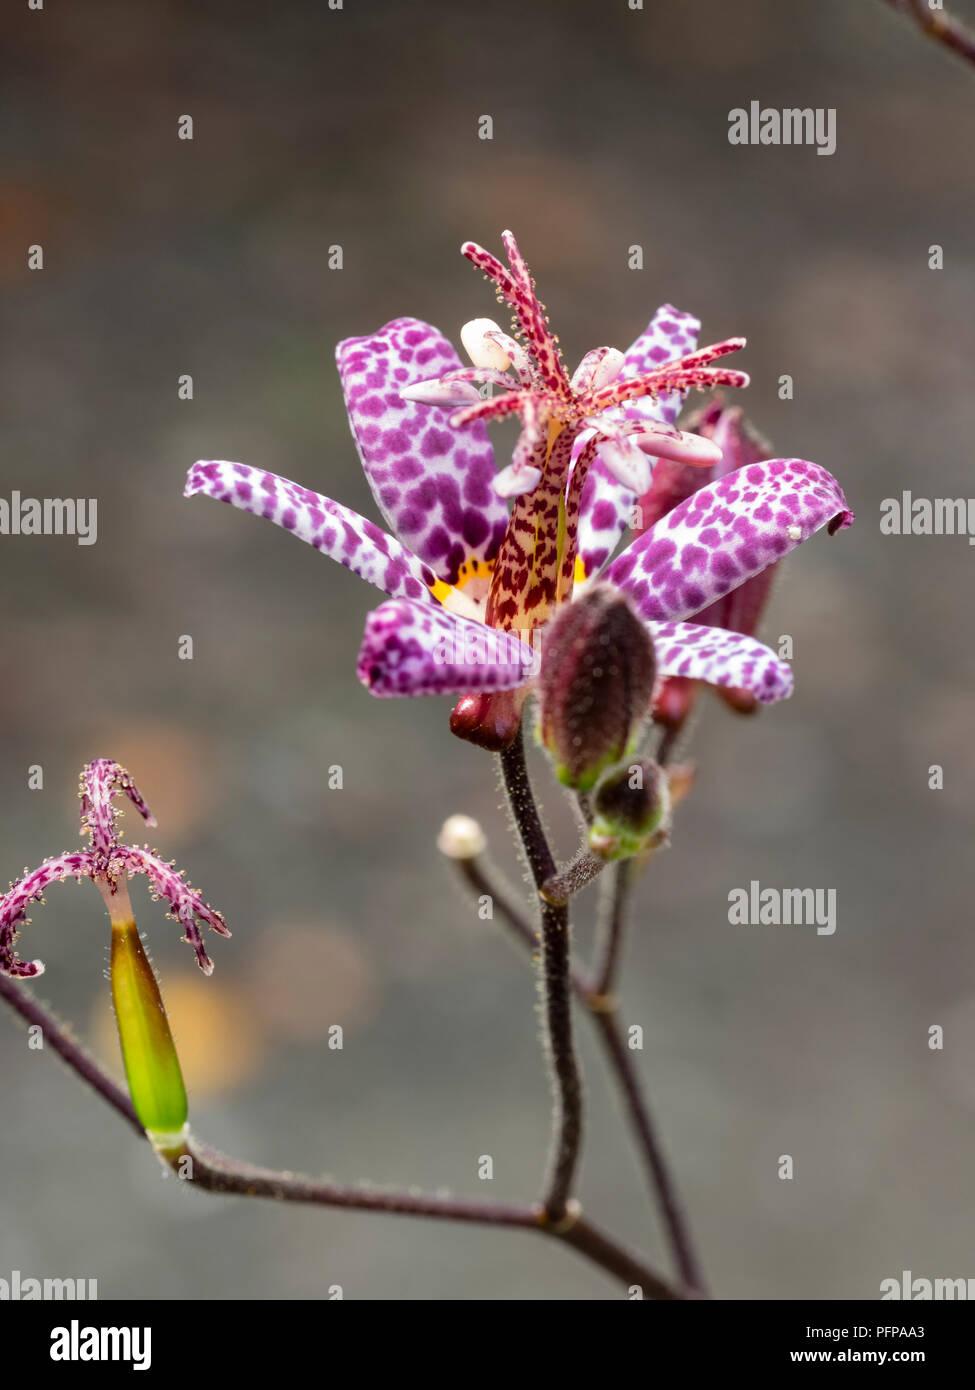 Tricyrtis Formosana Stockfotos & Tricyrtis Formosana Bilder - Alamy